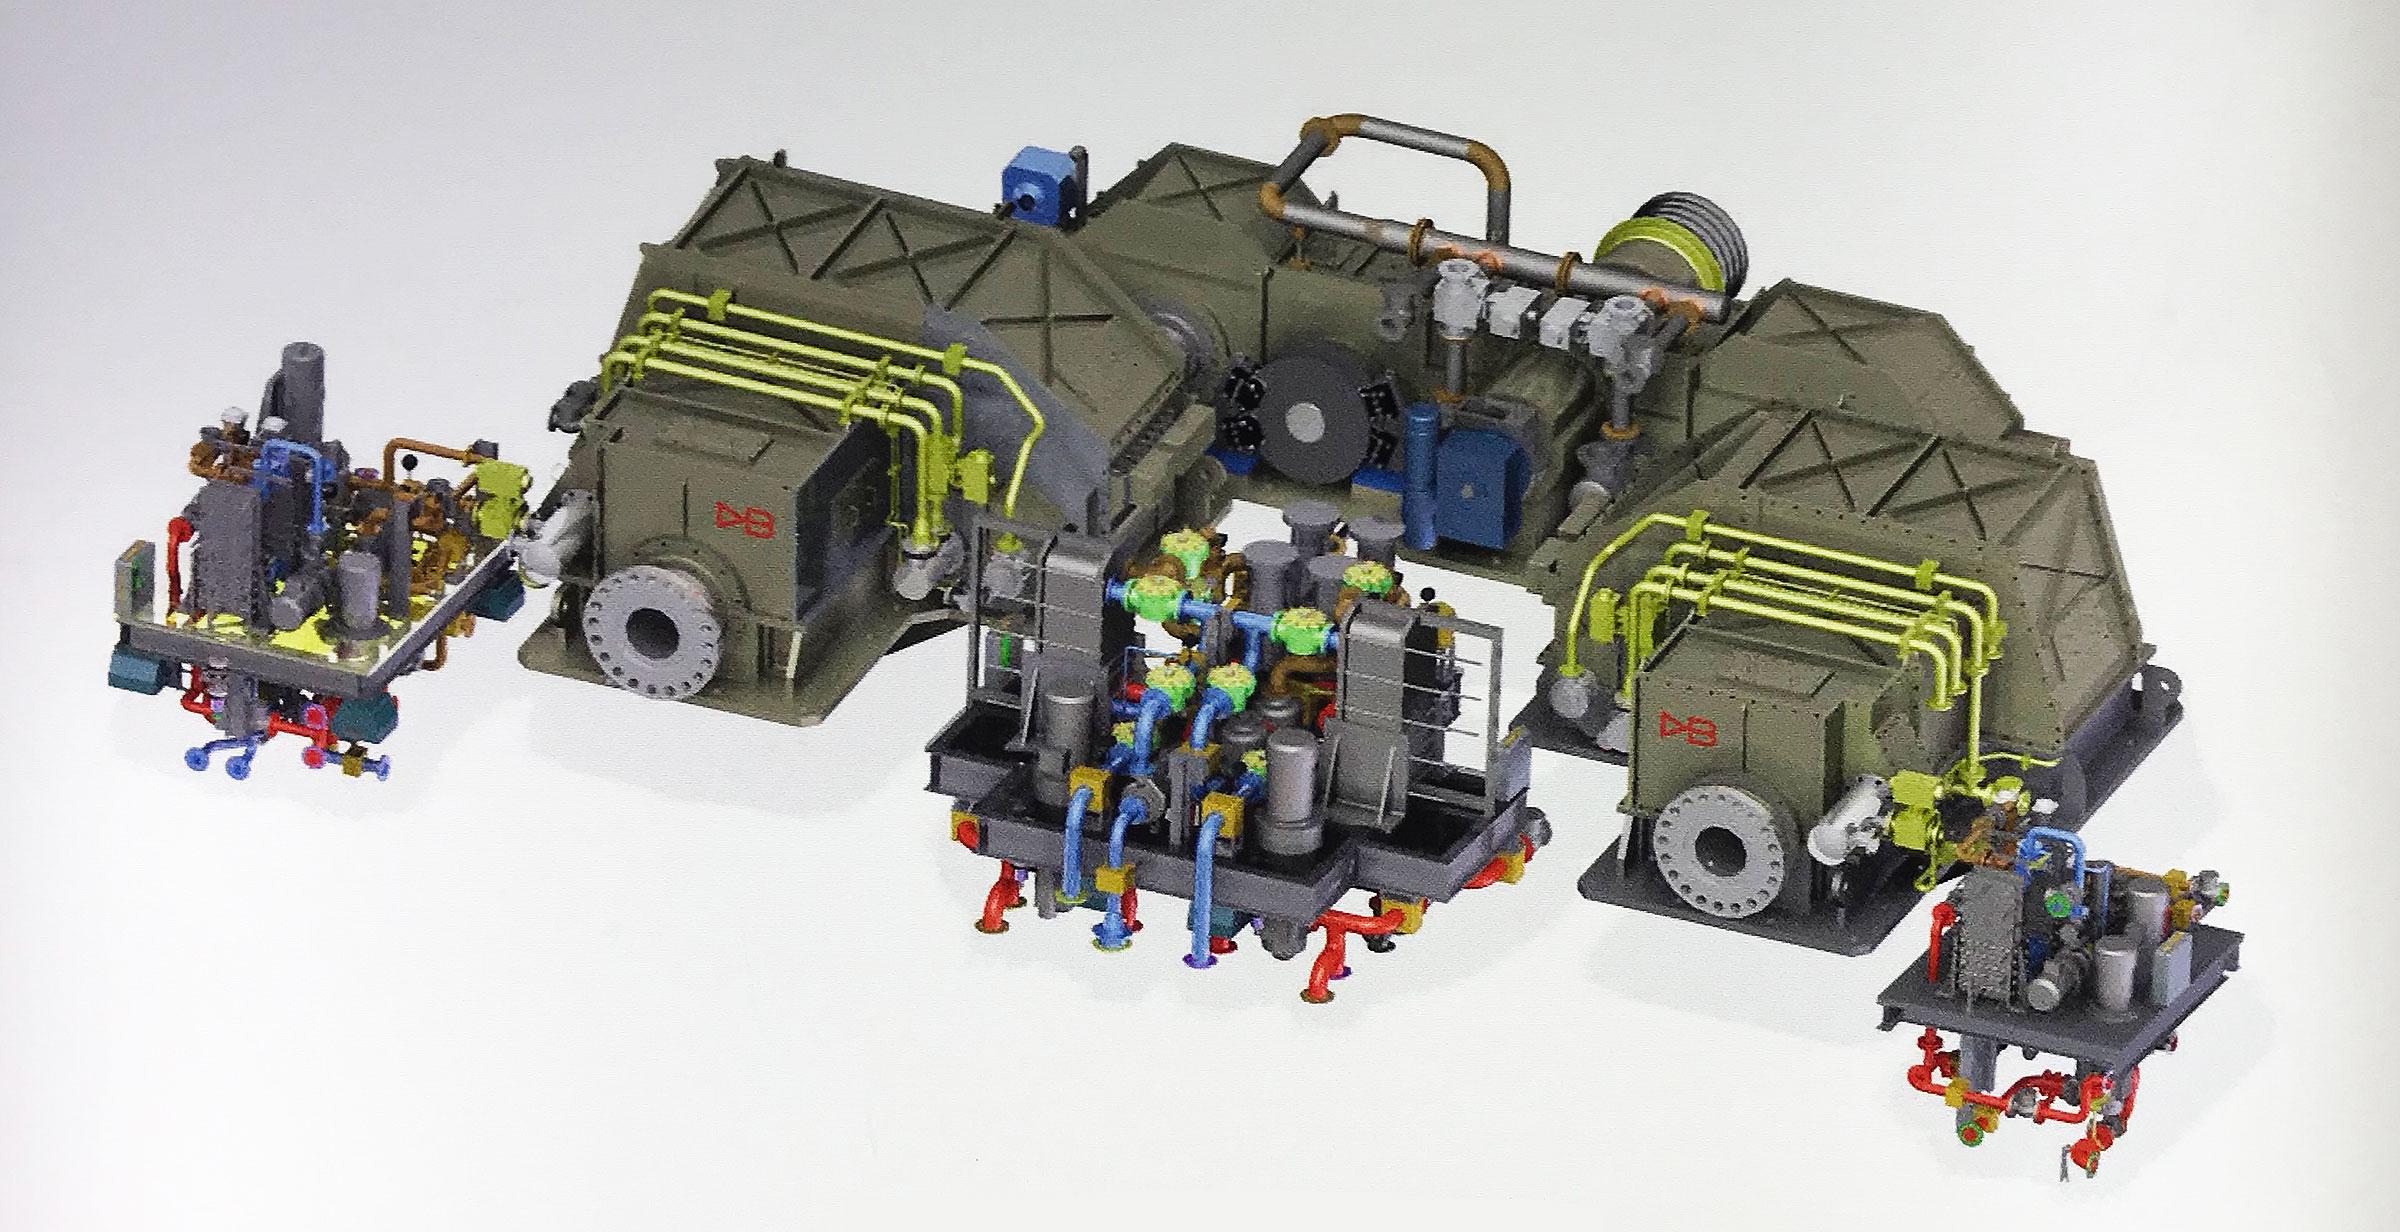 Type 26 frigate gearbox